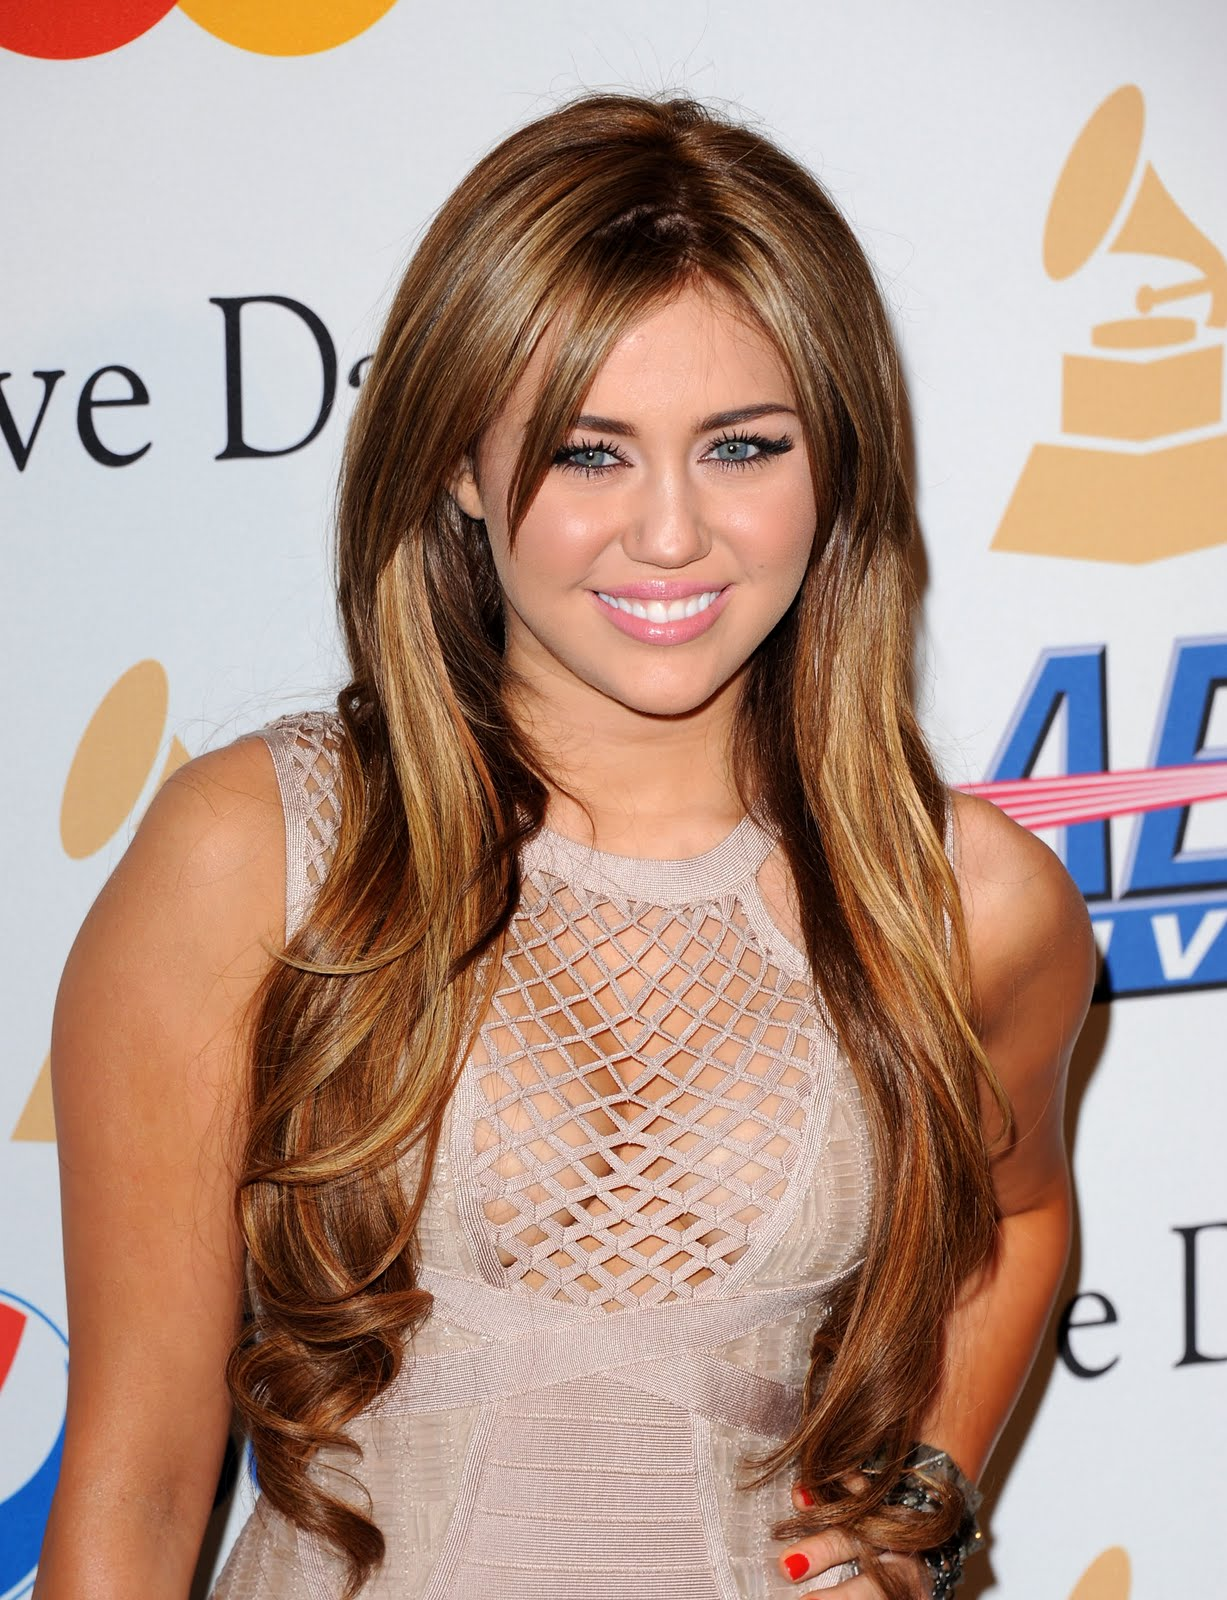 http://3.bp.blogspot.com/-8r7C4-AzEuI/TbgyeY4t1TI/AAAAAAAAAnU/uM9rx17bx4k/s1600/Miley-Cyrus_COM_CliveDavisGrammyParty_12Feb2011_008.jpg